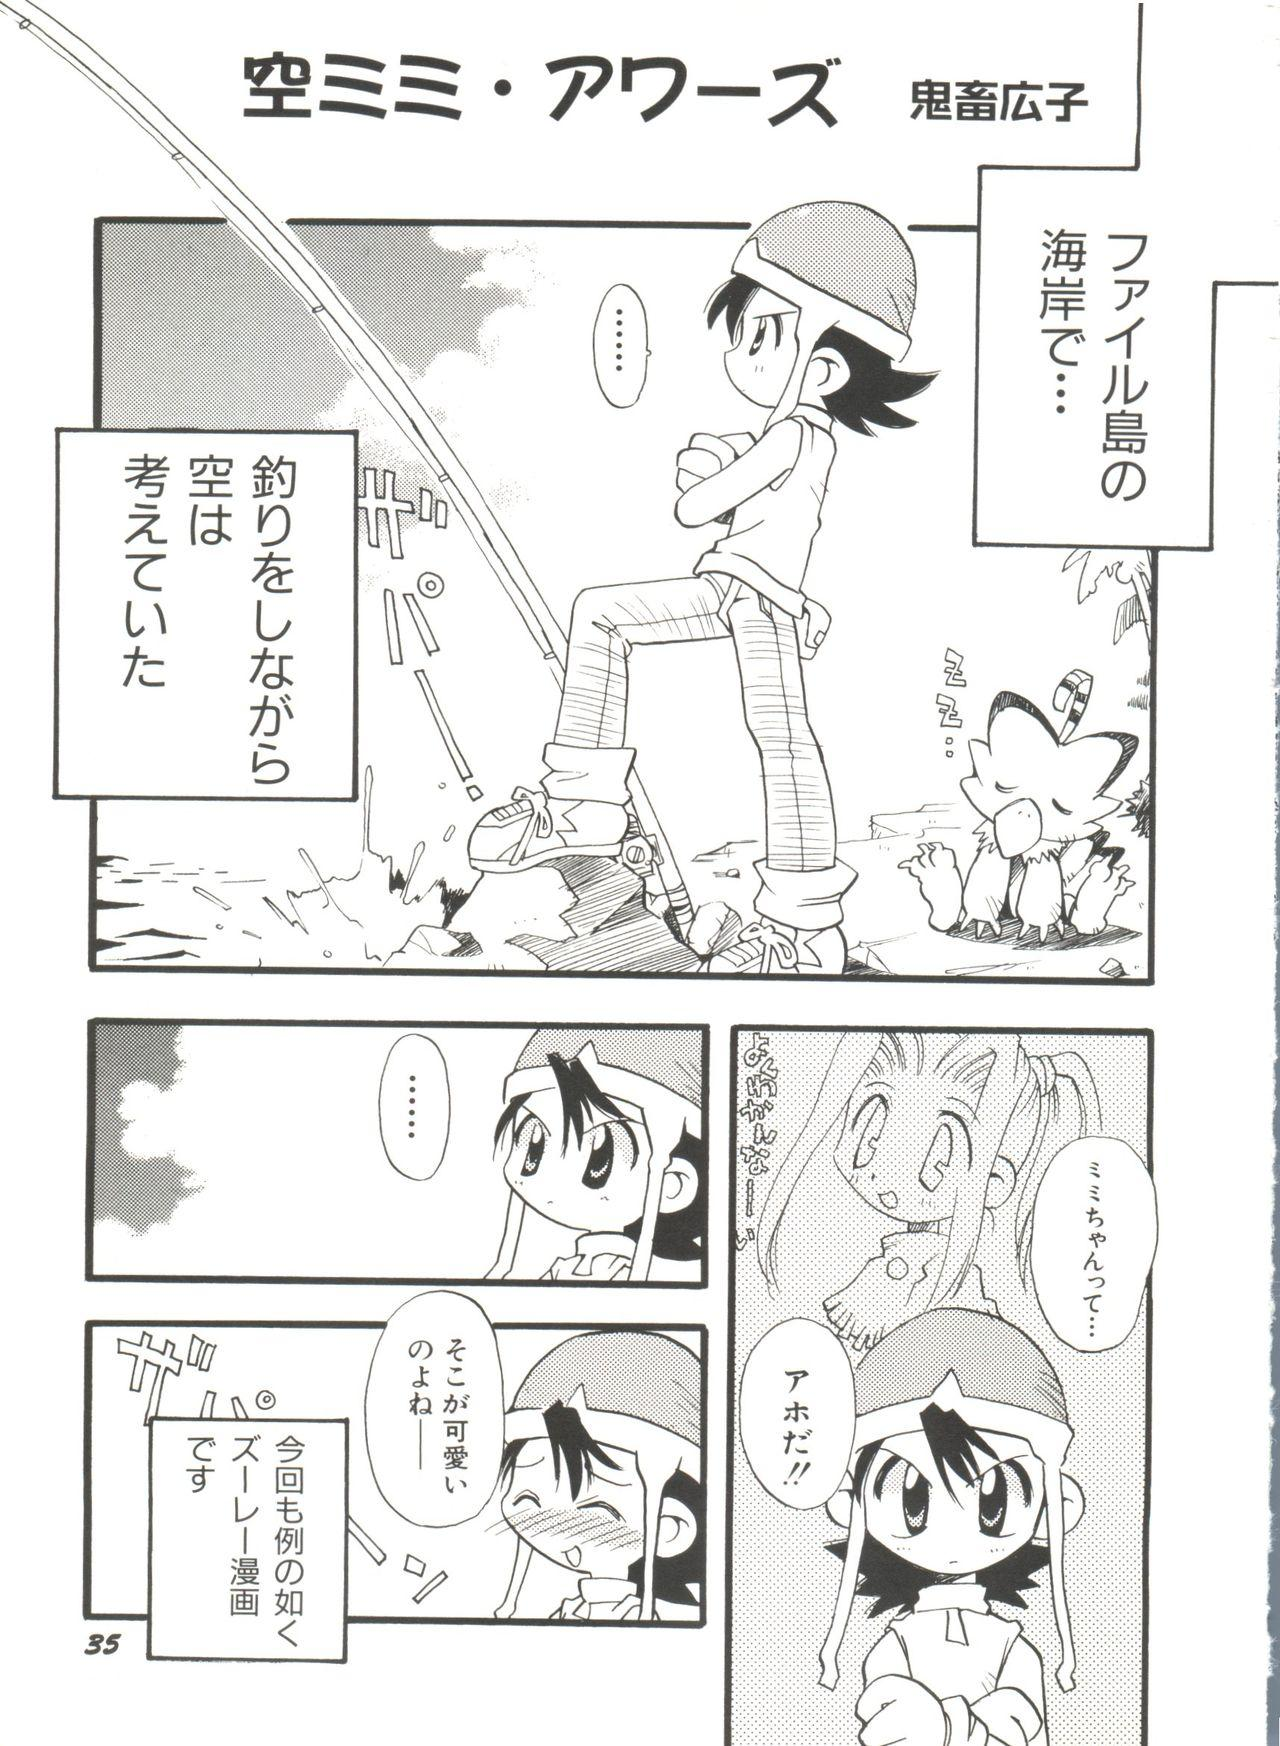 [Anthology] Denei Tamatebako 8 - Utakata no Tenshi-tachi II (Various) 36